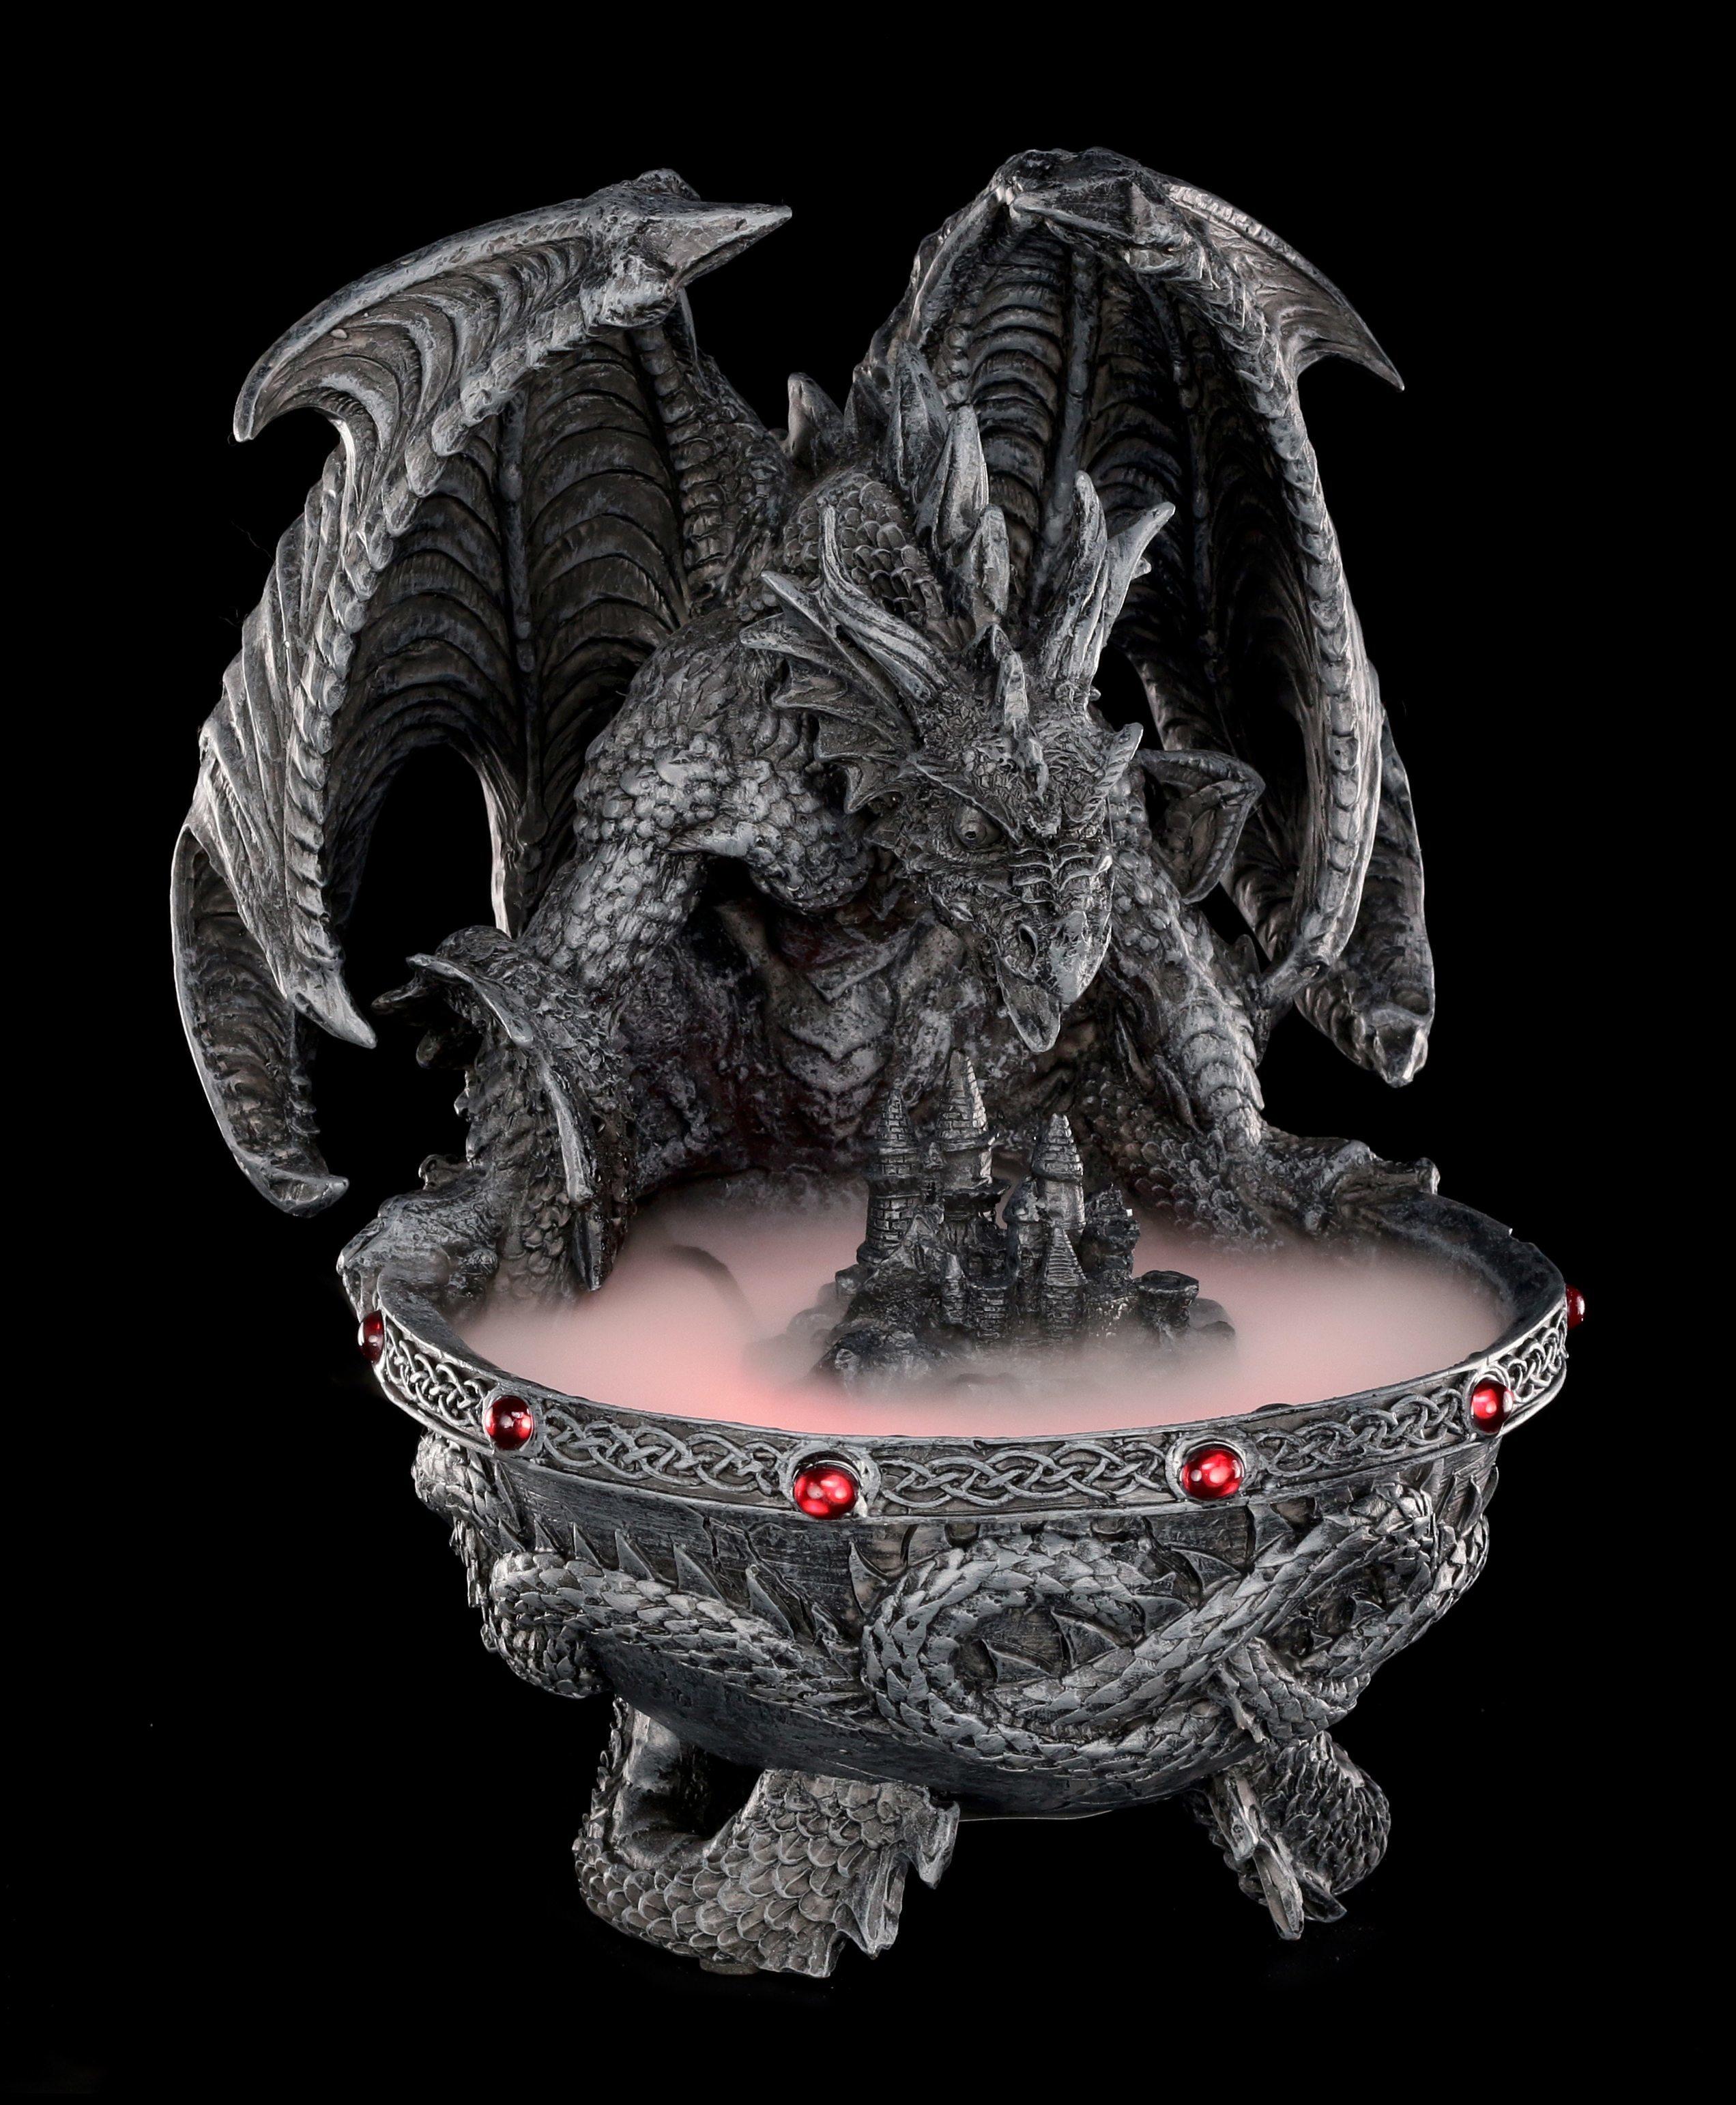 Nackte astrid aus dragon cartoon streaming